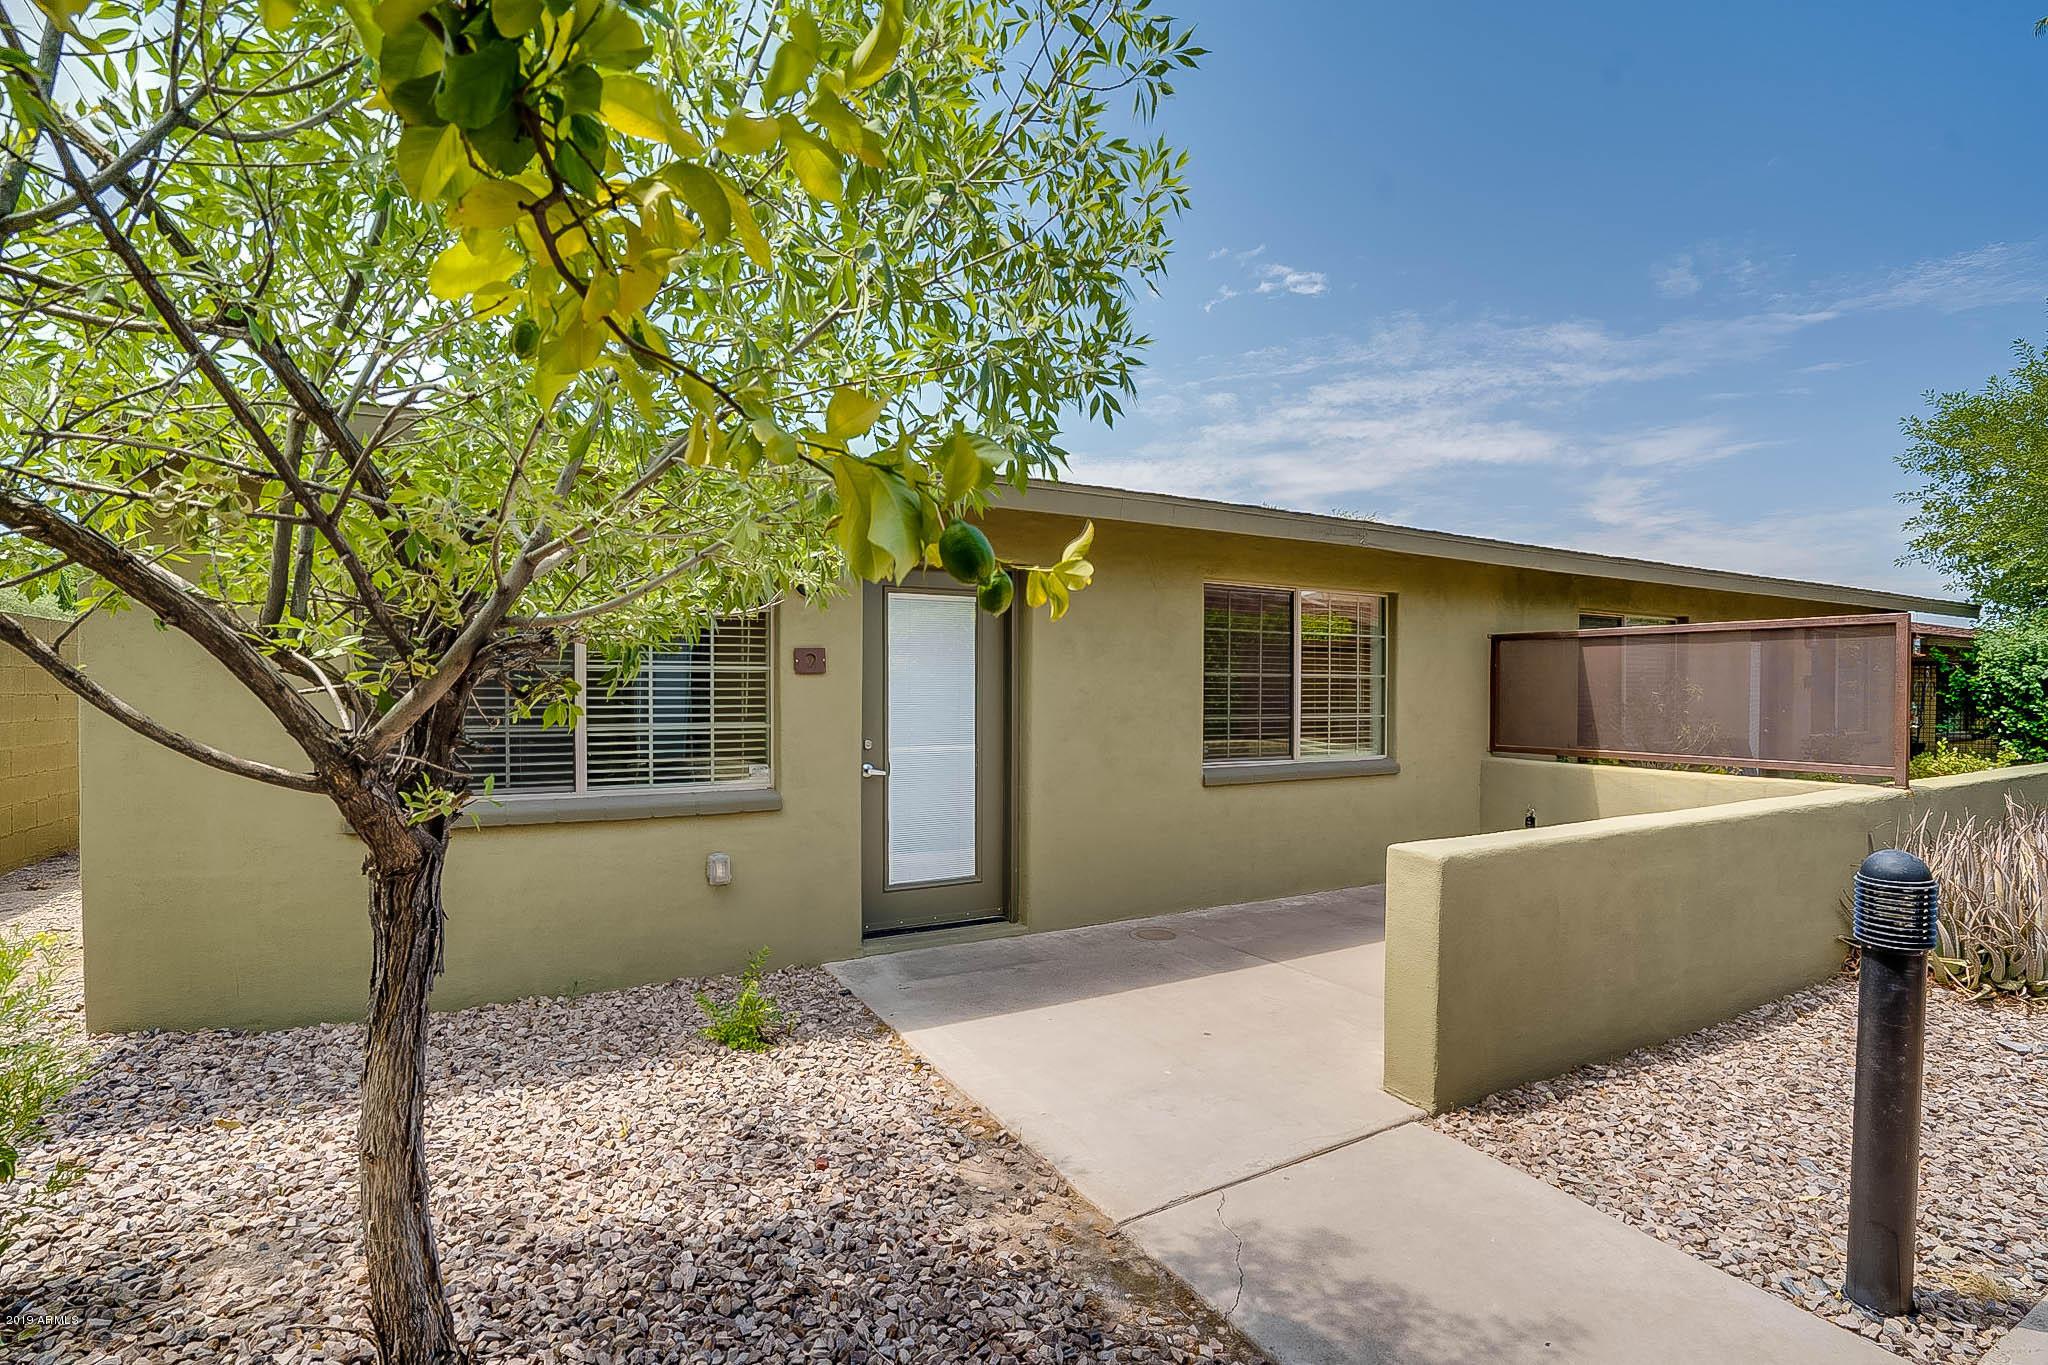 Photo of 1850 E MARYLAND Avenue #9, Phoenix, AZ 85016